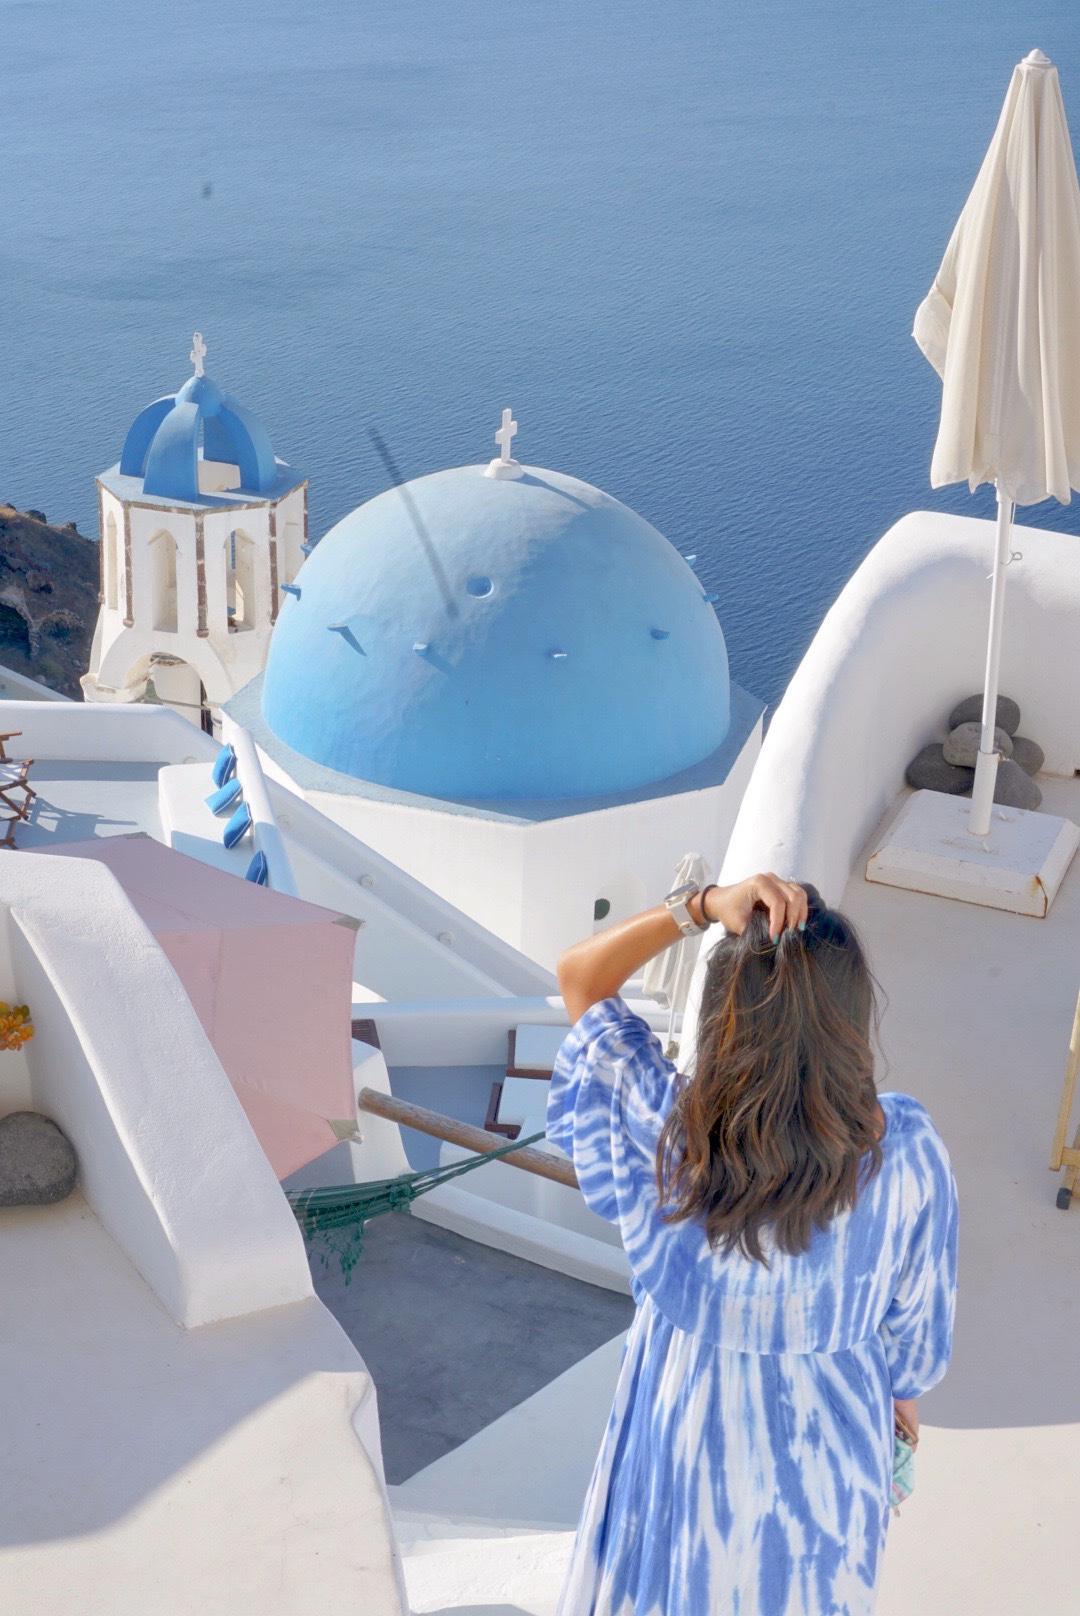 acs 0269 - A Few Days in Santorini